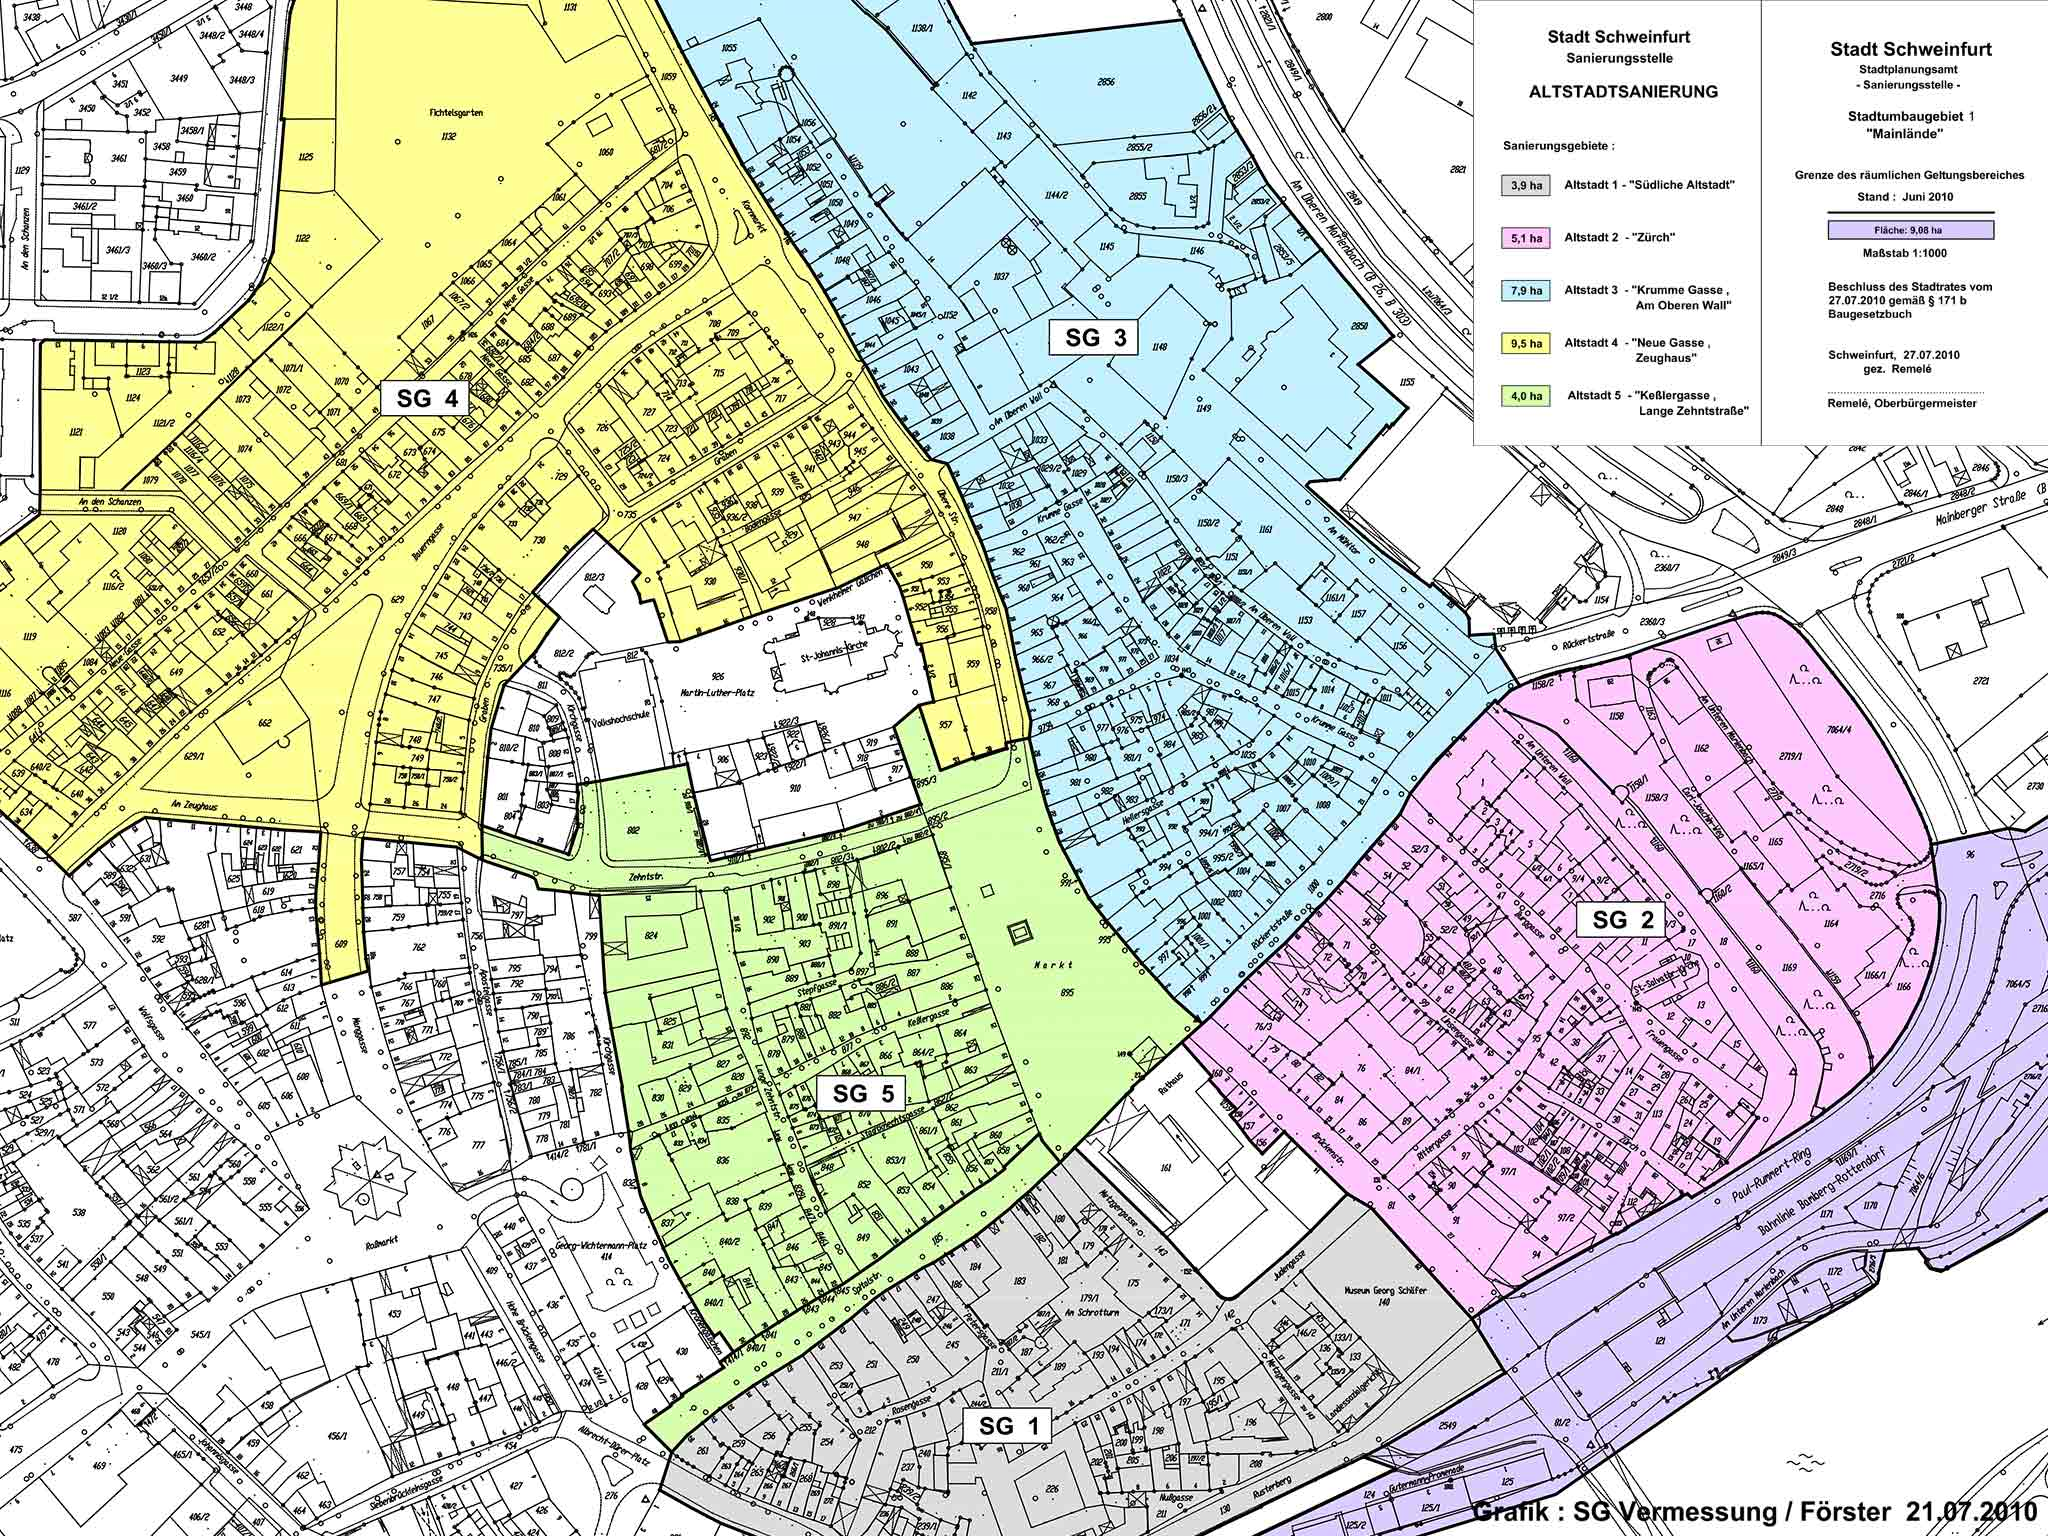 Altstadtsanierungsplan. Grafik: SG Vermessung / Förster, Stadt Schweinfurt